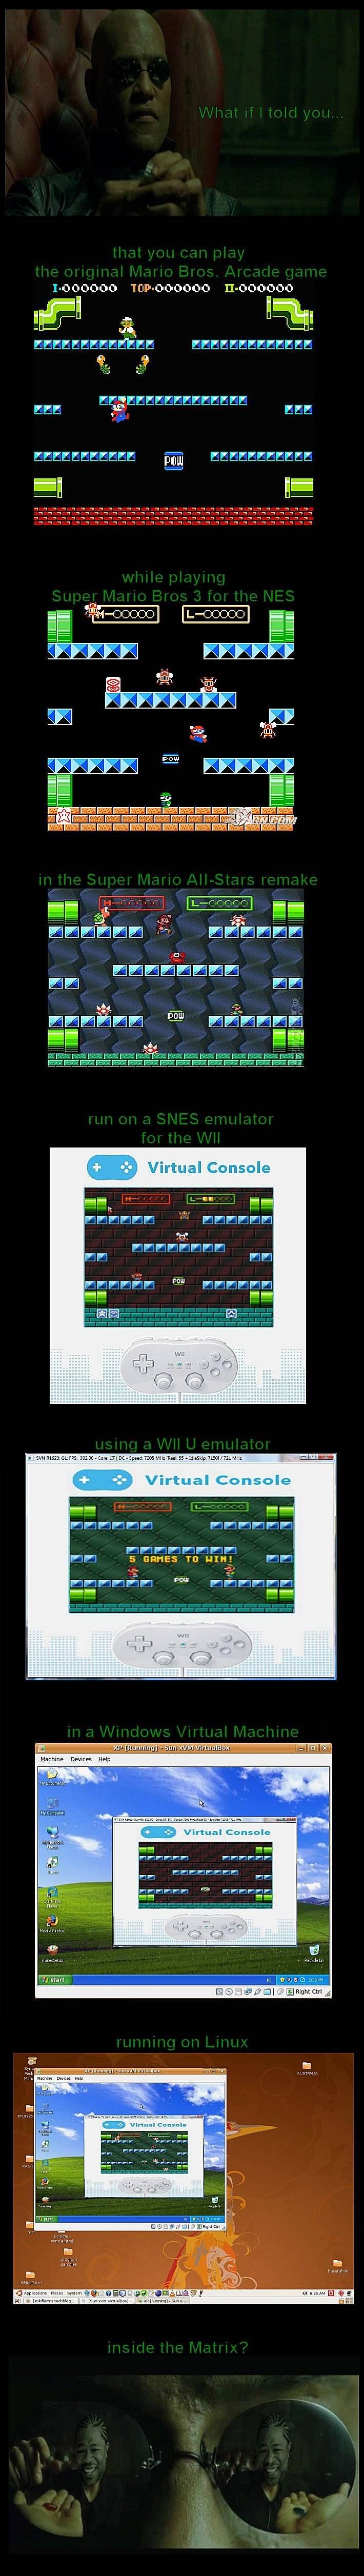 So I Heard that you like Emulators.... . Ett, EEO EEO iei Eiio? mimejr Emulators